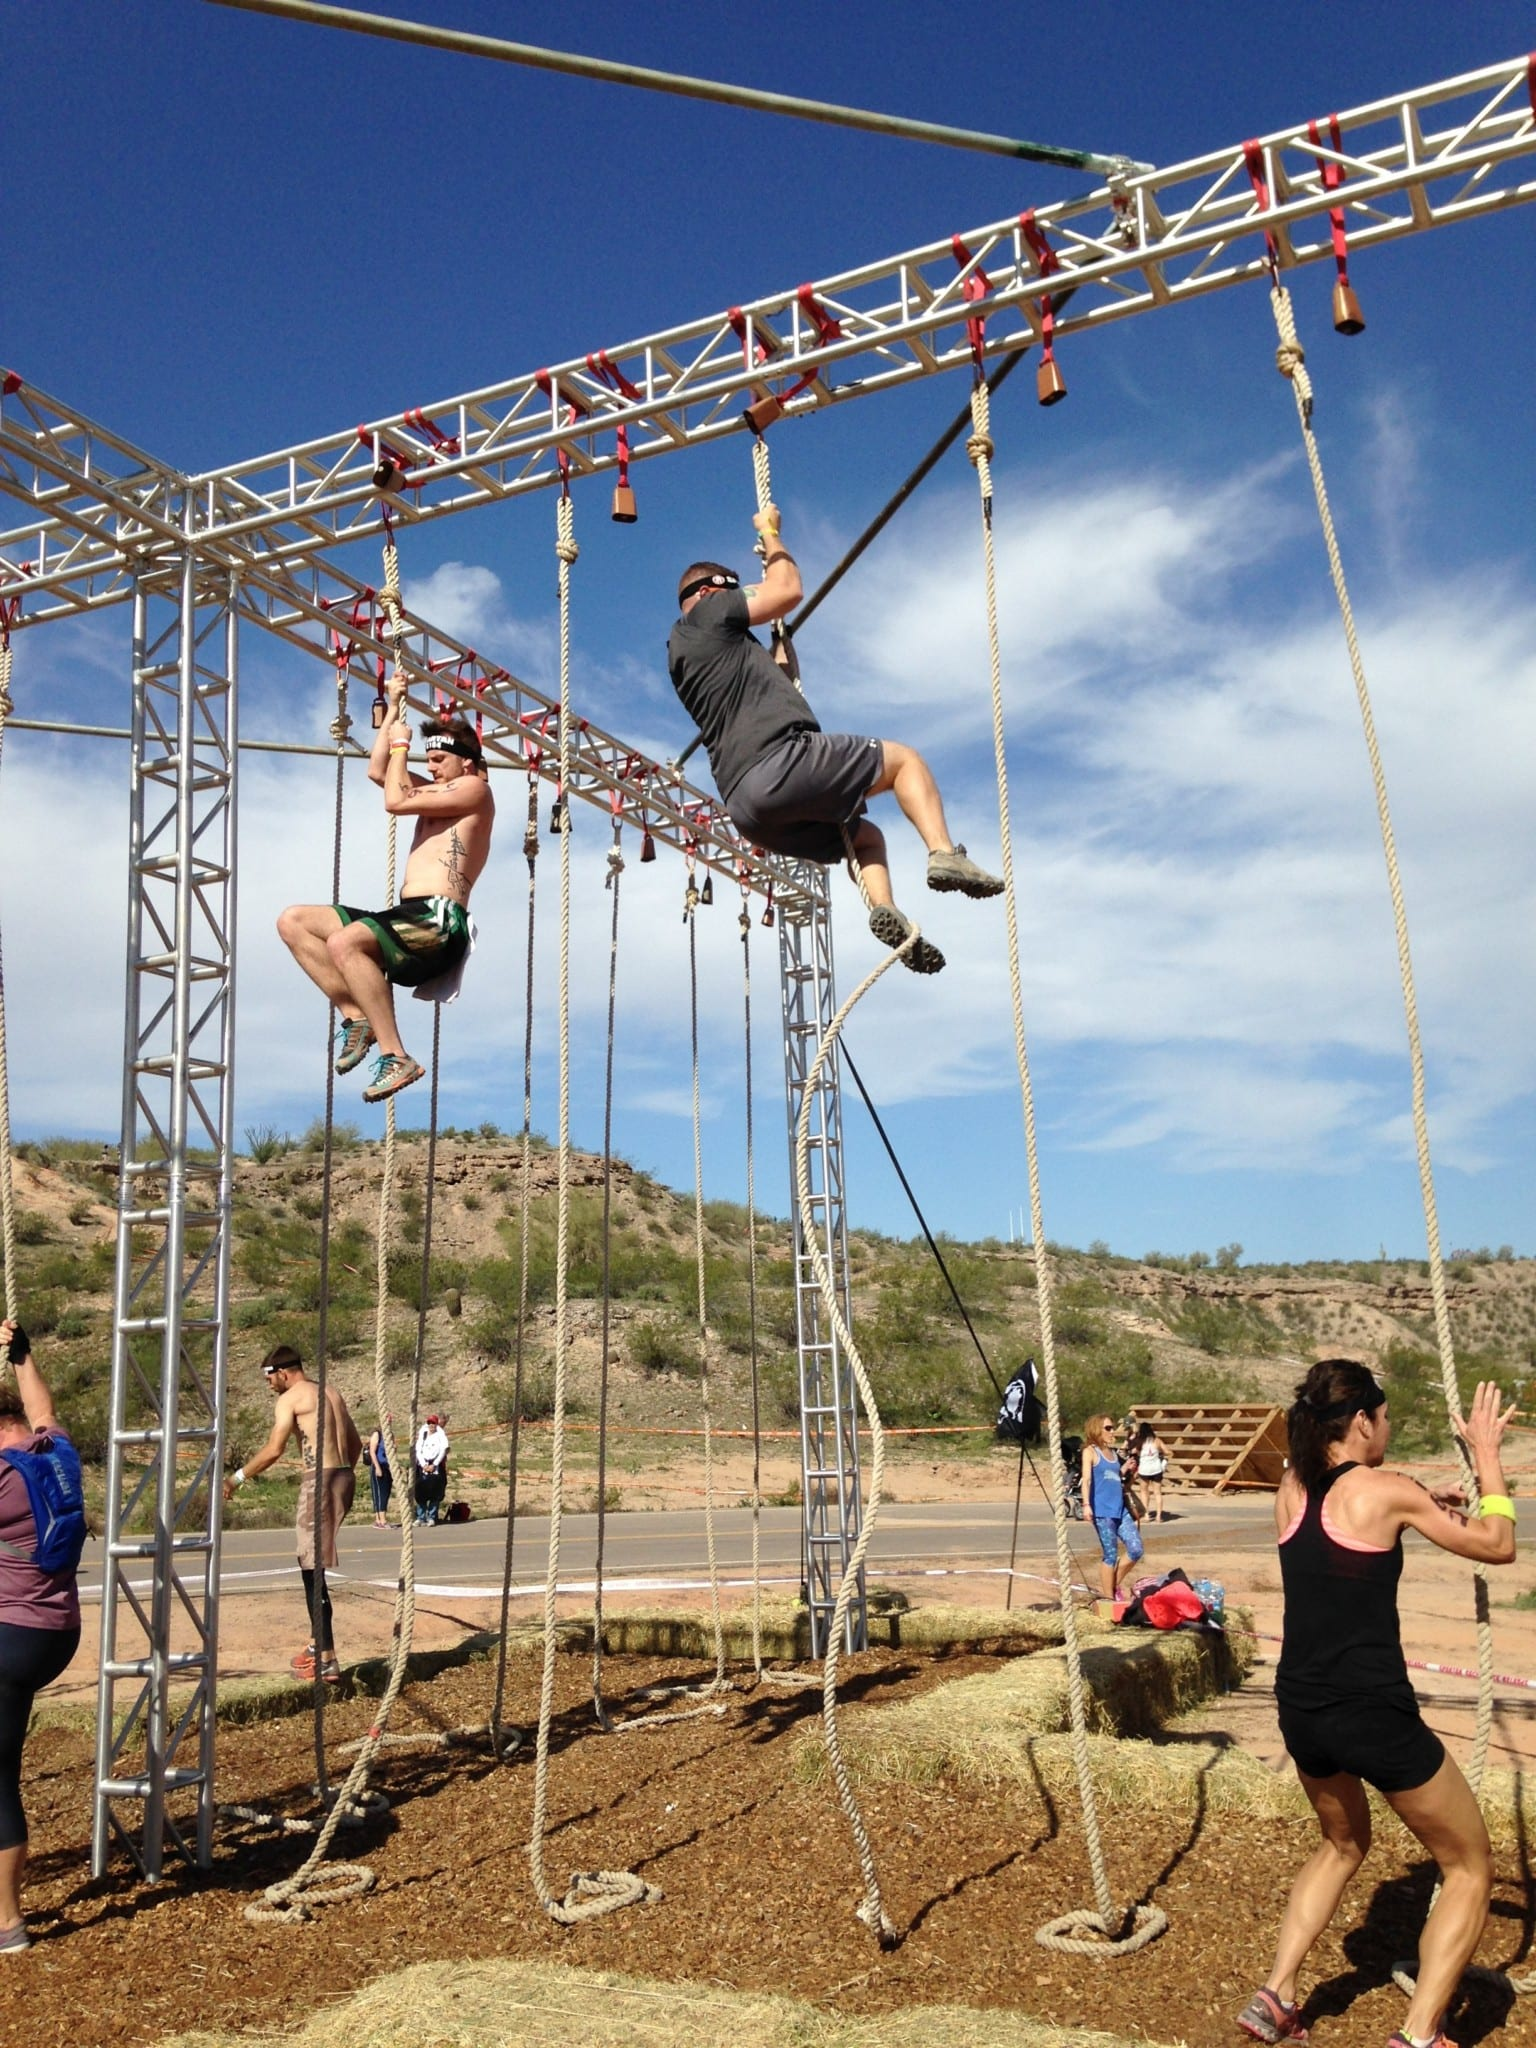 Spartan Arizona Rope climb